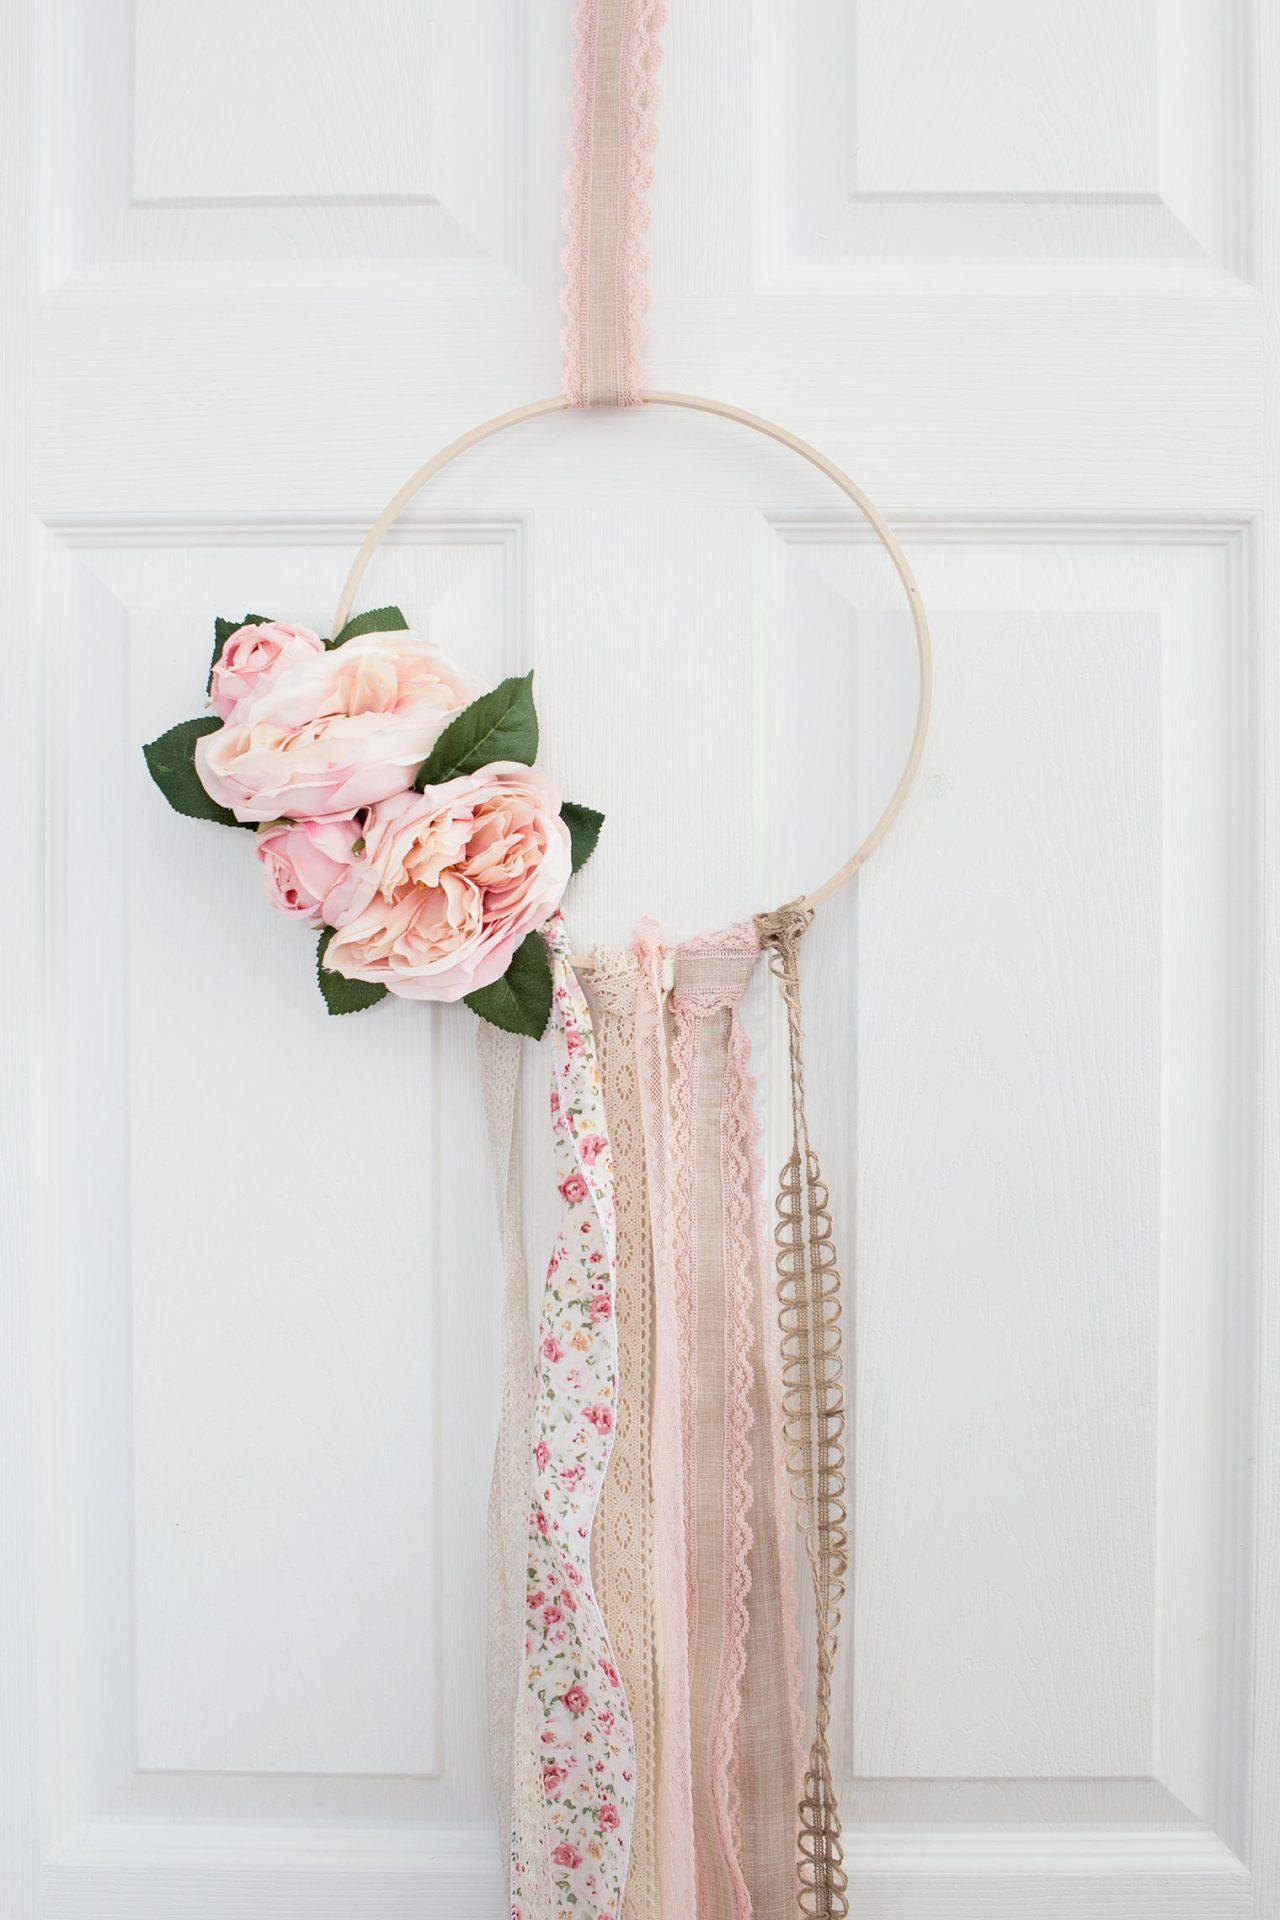 Boho hoop wreath with ribbons nad pink flowers.